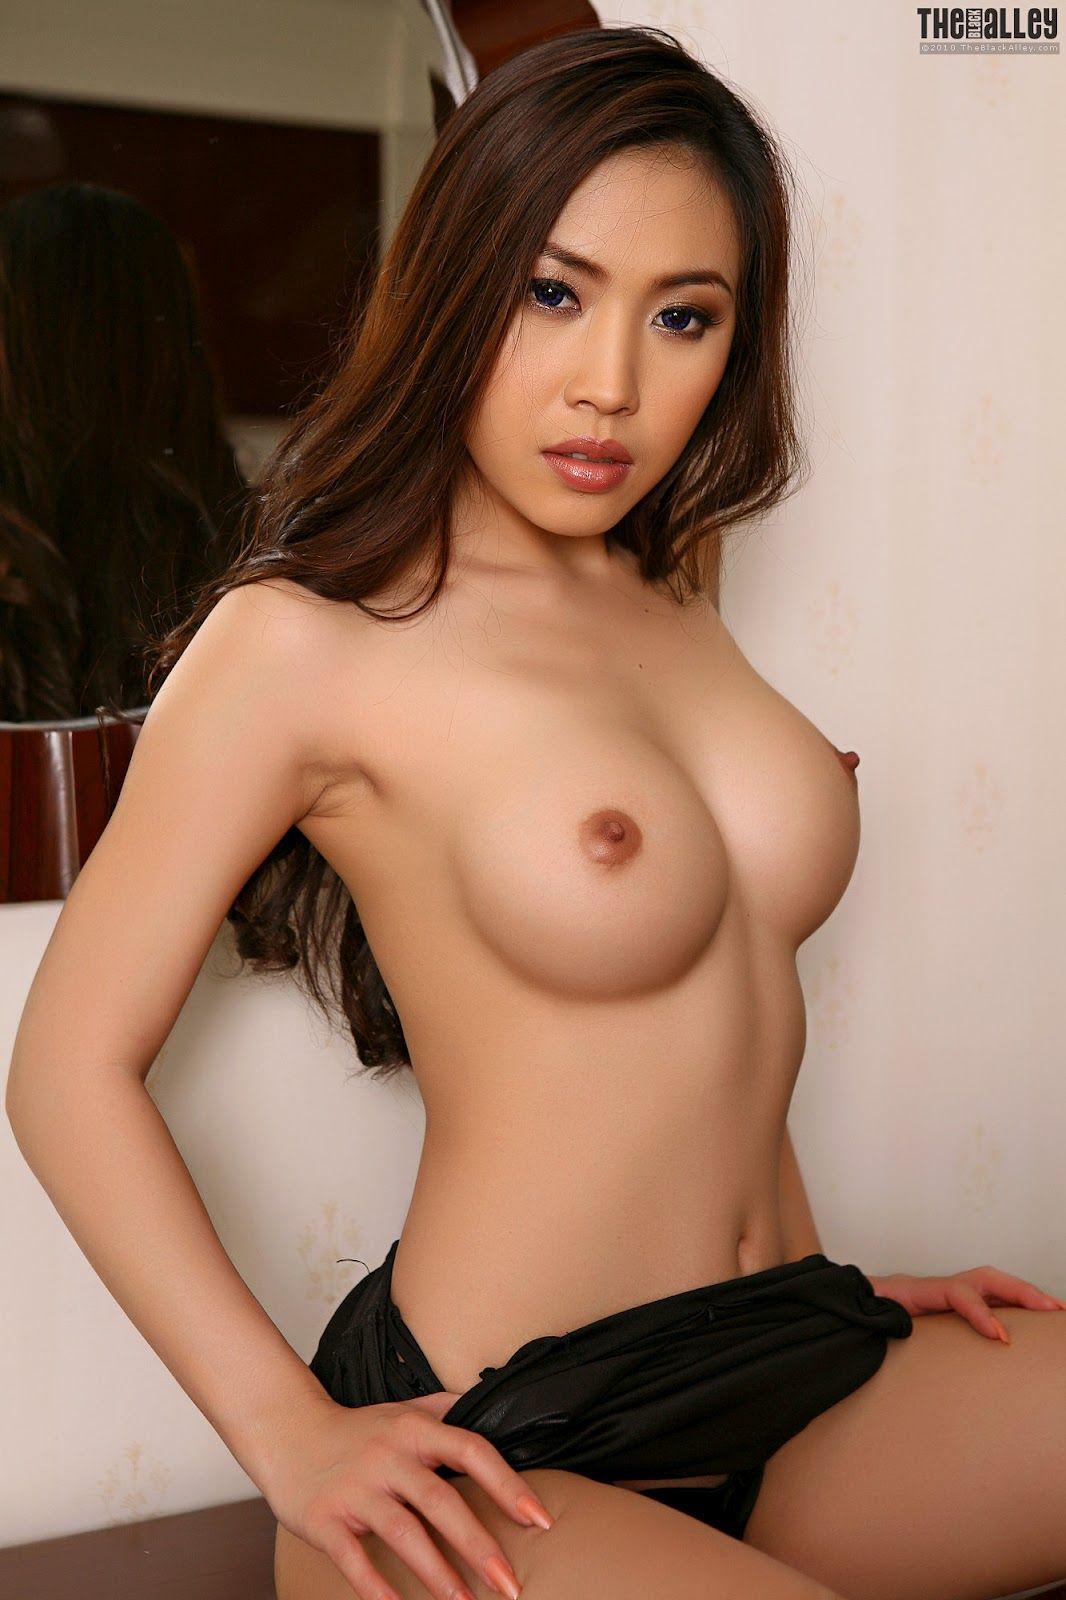 Keiko Kitagawa Nude Cheap lisa lee - perfect asian boobs blog | x-001 | pinterest | lisa